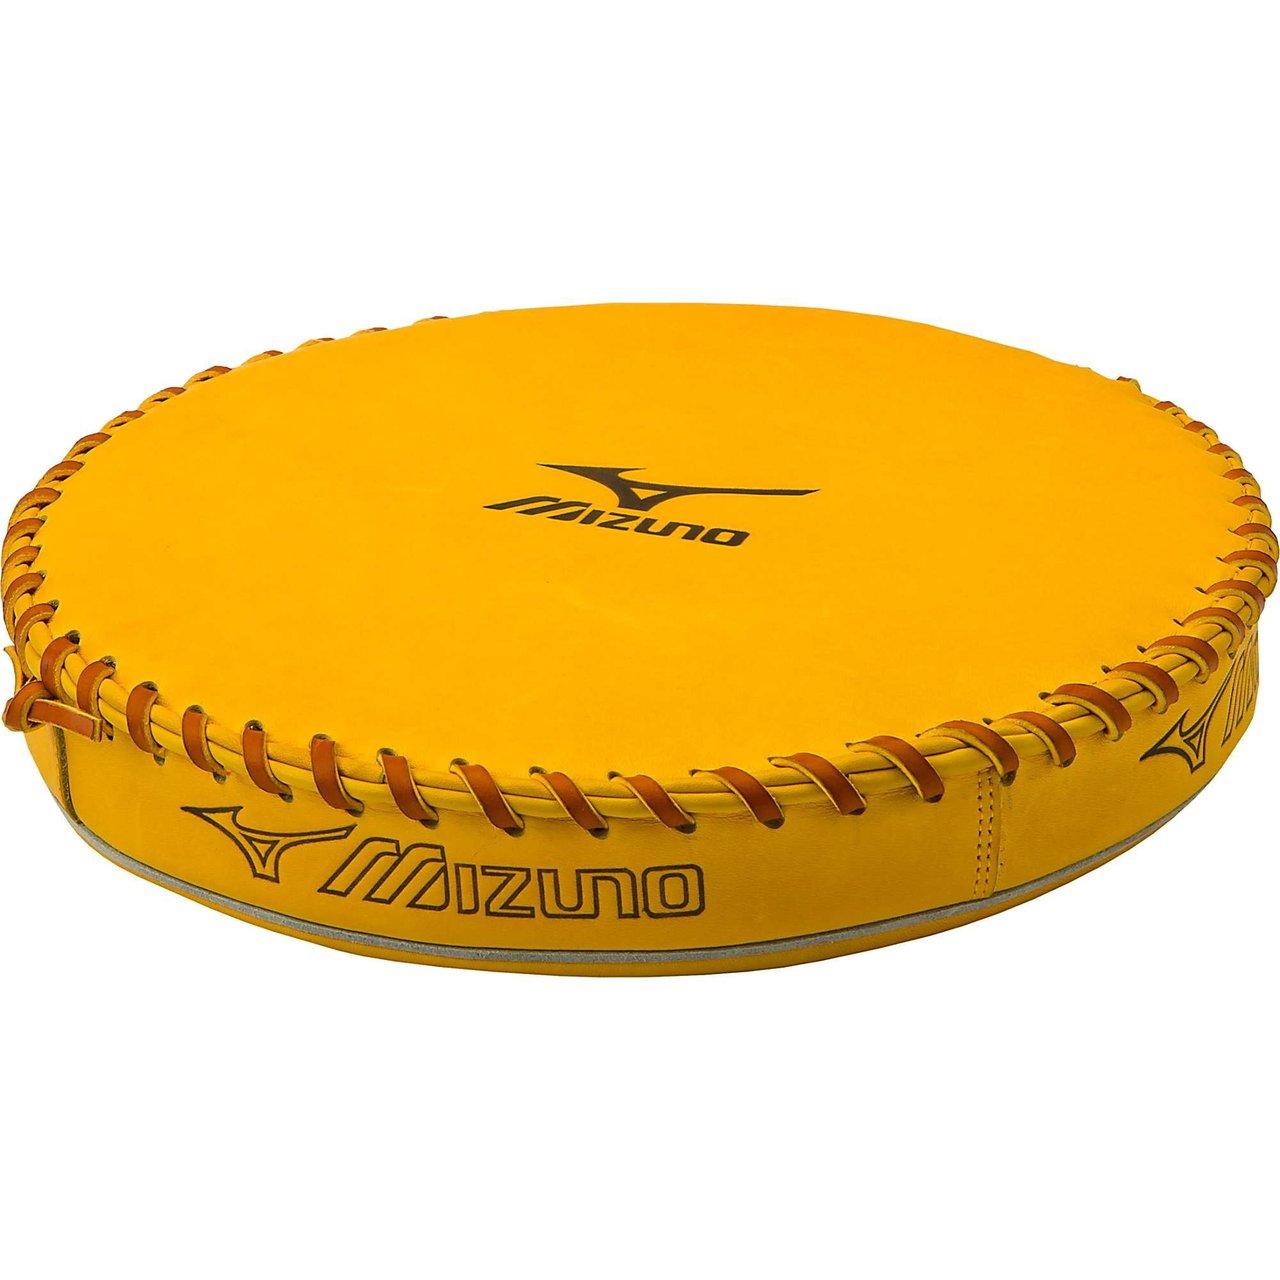 mizuno-baseball-glove-pounding-pad 370128 Mizuno 041969152898 Full grain leather shell.. Laced binding .Concave design helps break gloves